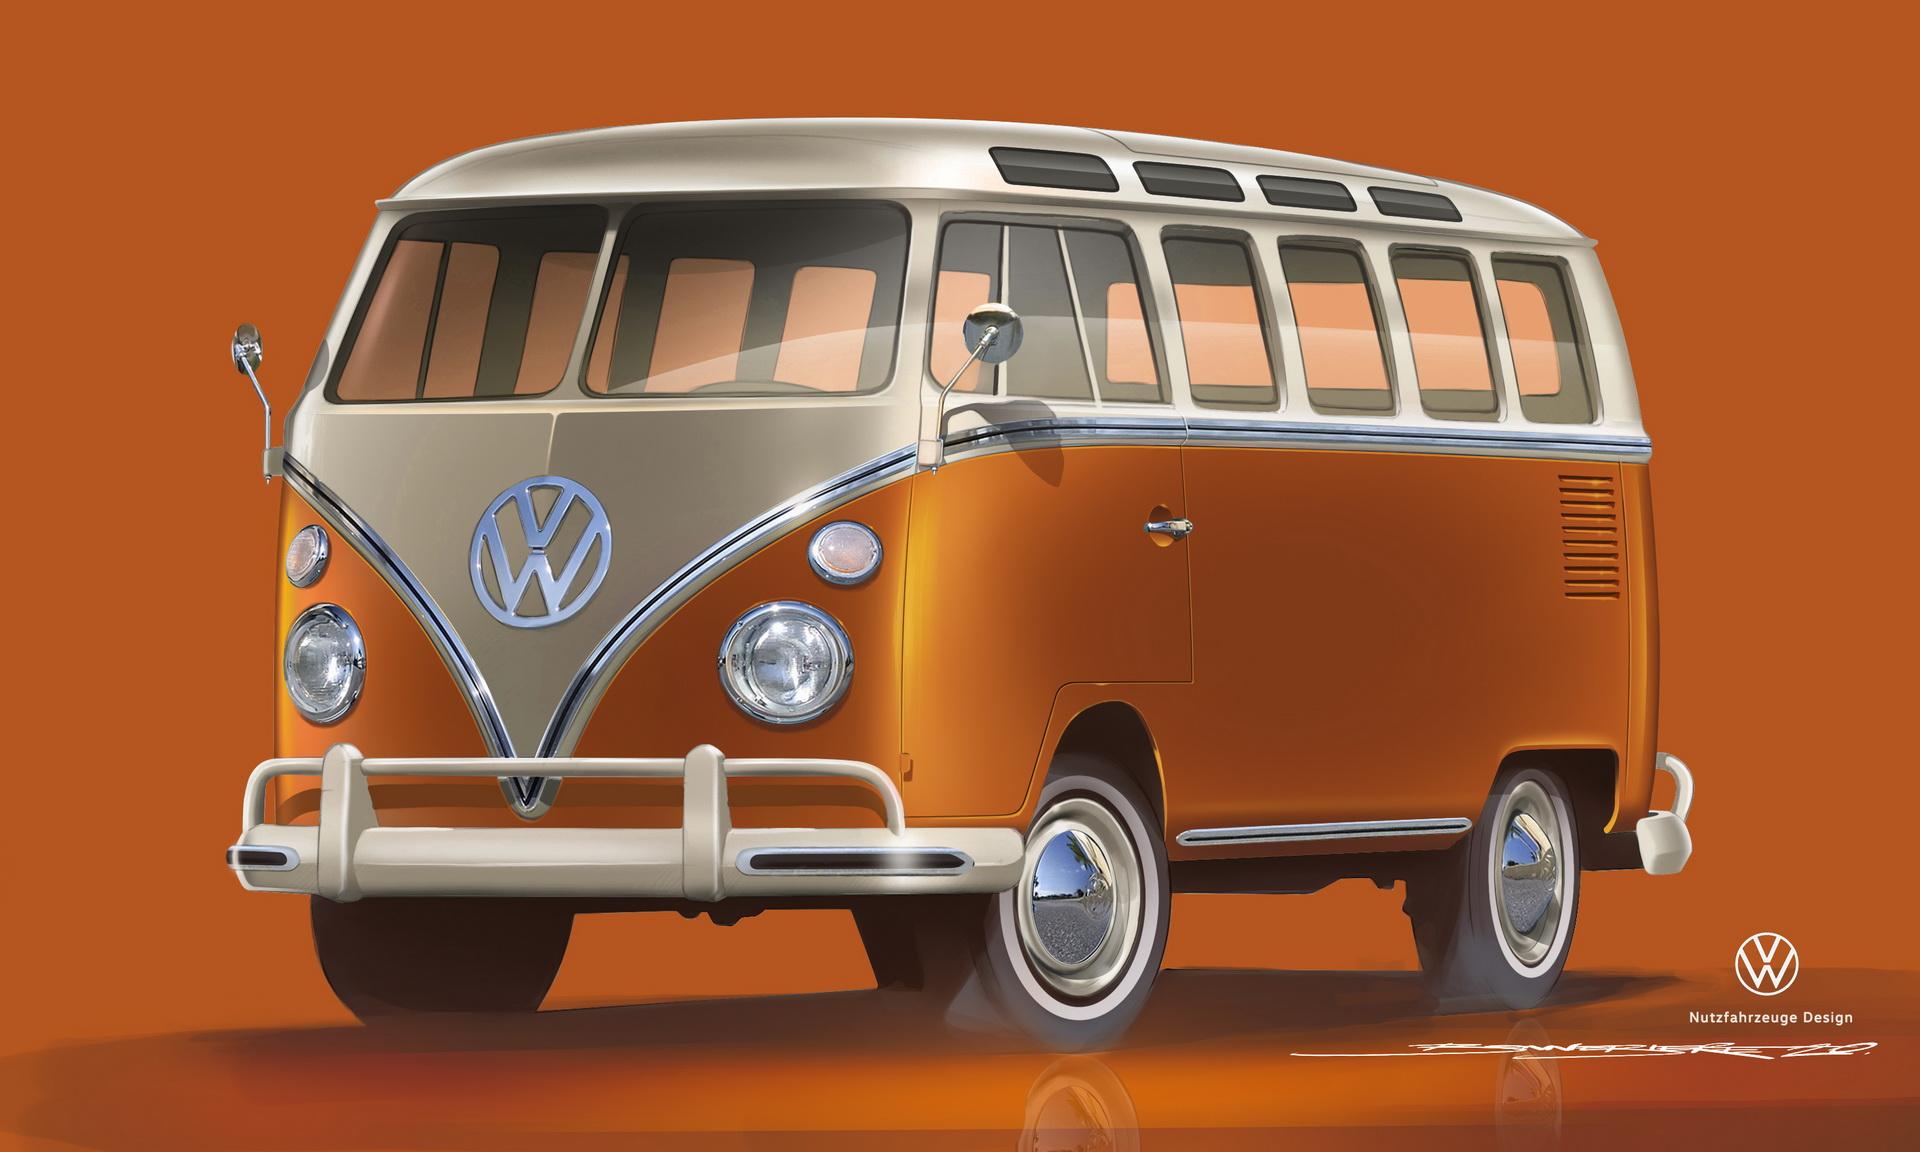 Volkswagen T1 E Bulli An Electric 1966 Samba Bus Paultan Org